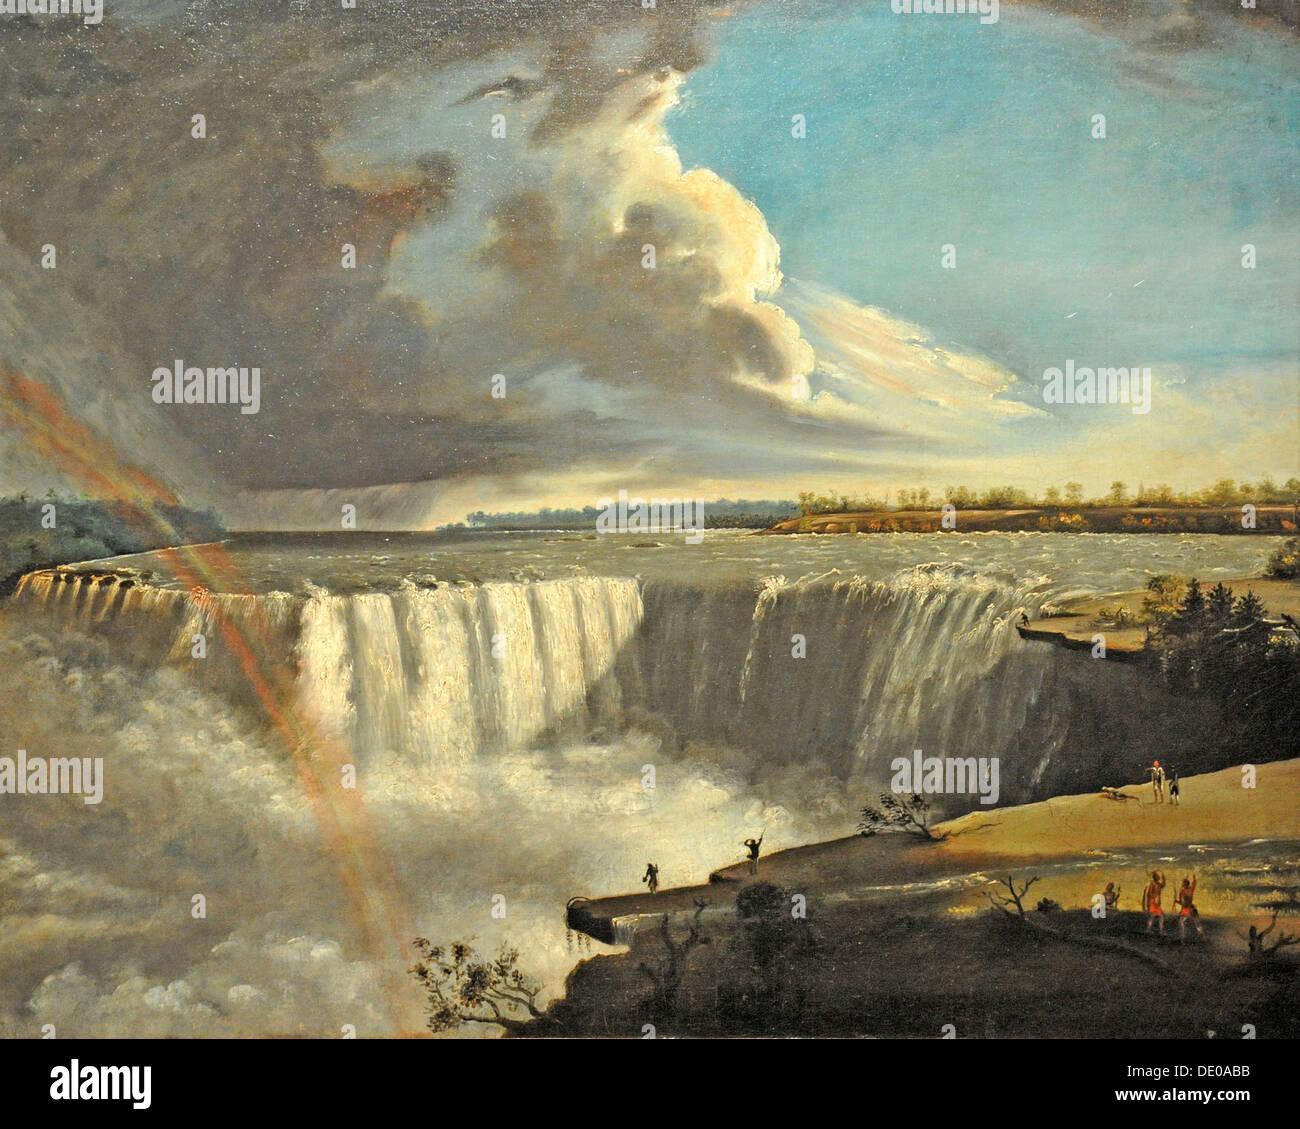 Niagara Falls from Table Rock, 1835. Artist: Morse, Samuel Finley Breese (1791-1872) - Stock Image